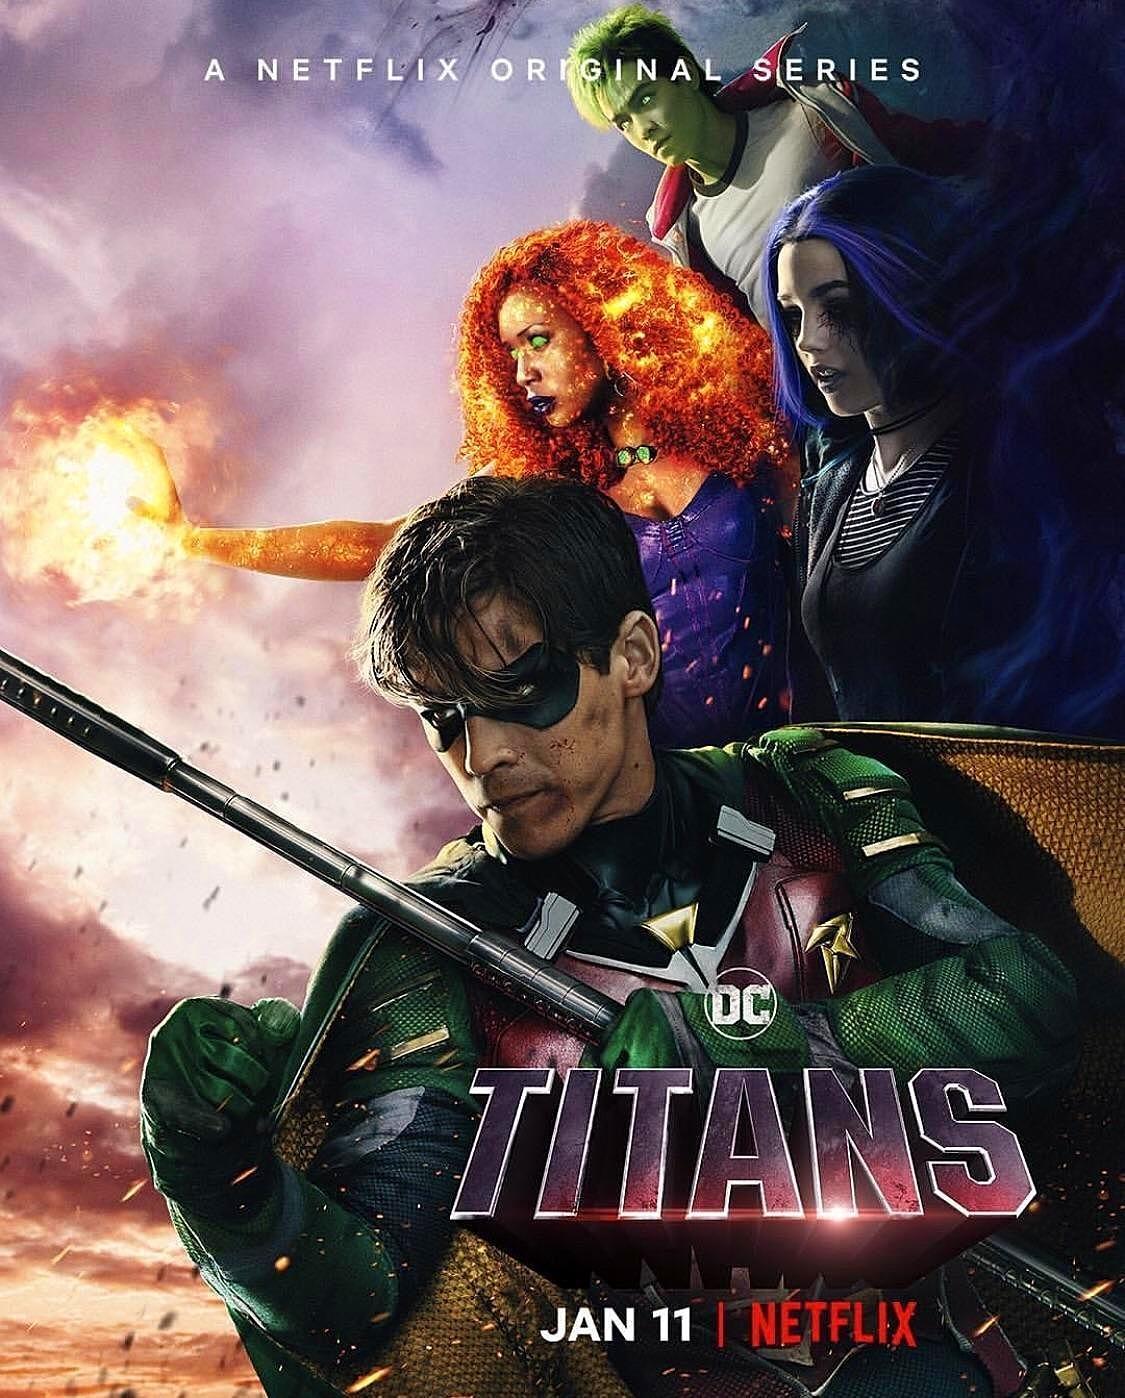 Titans T01 720p Netflix